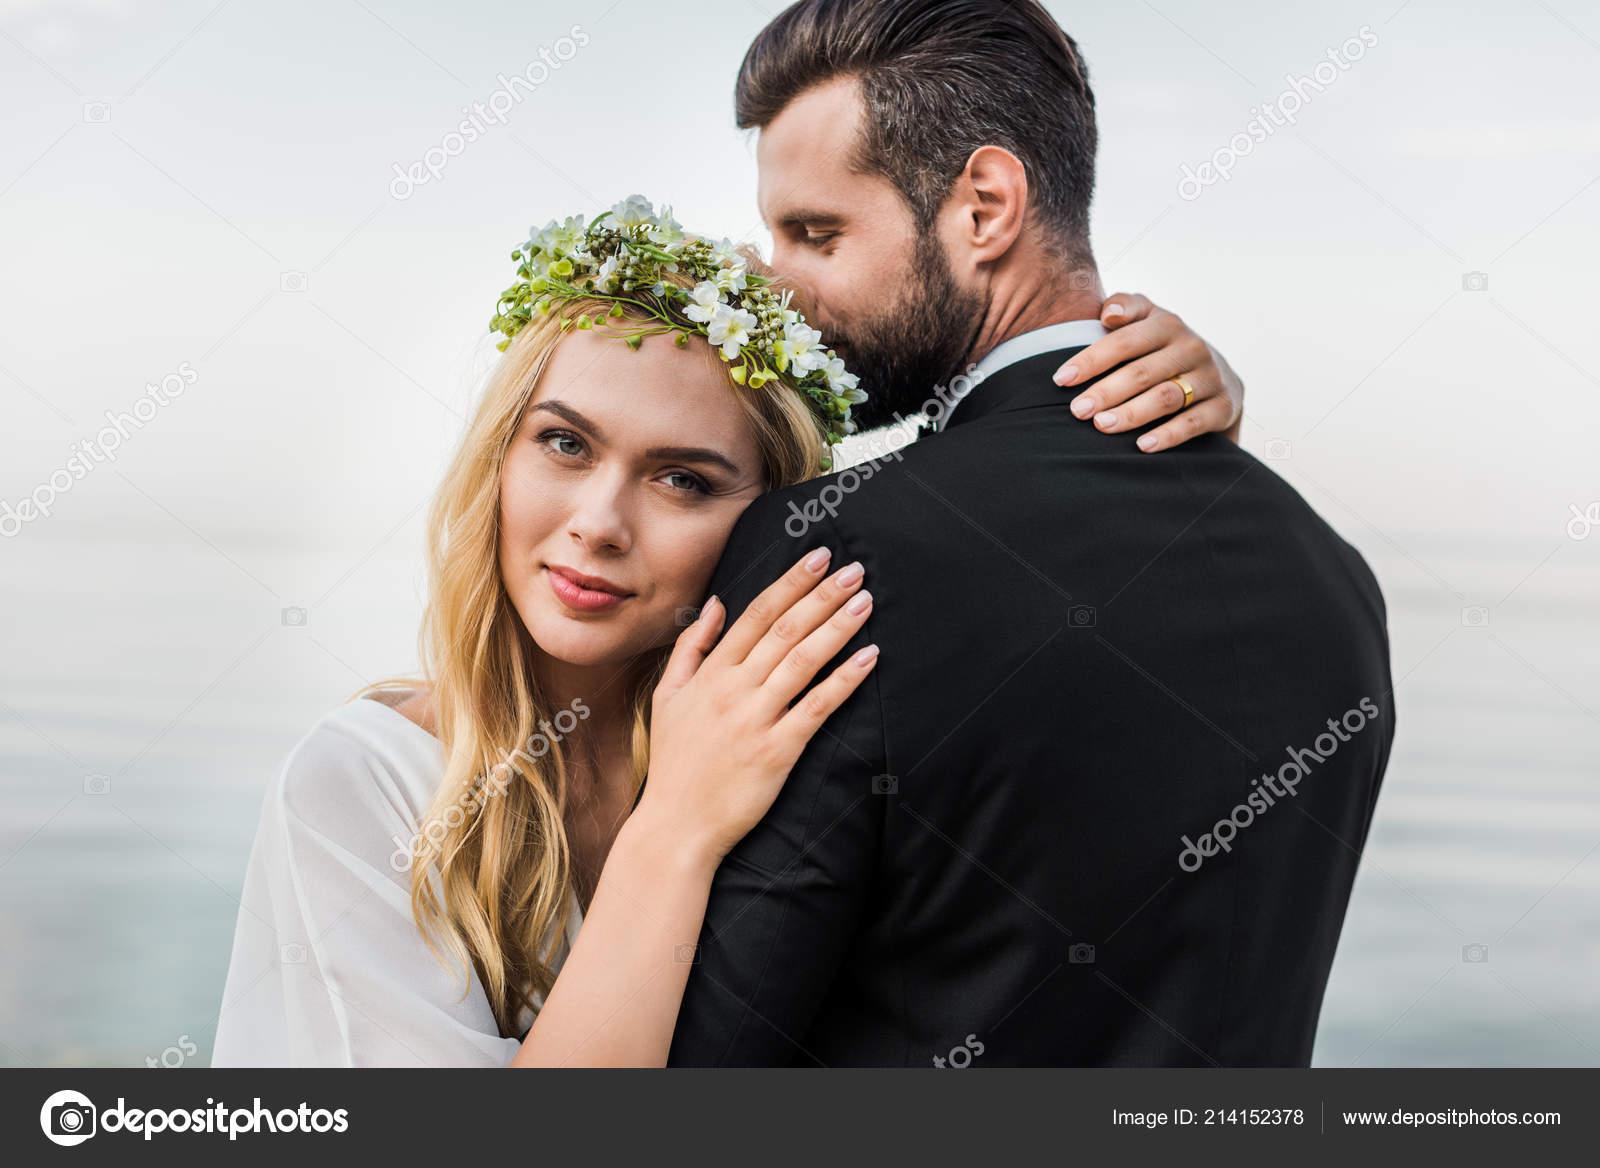 cuddling christian dating